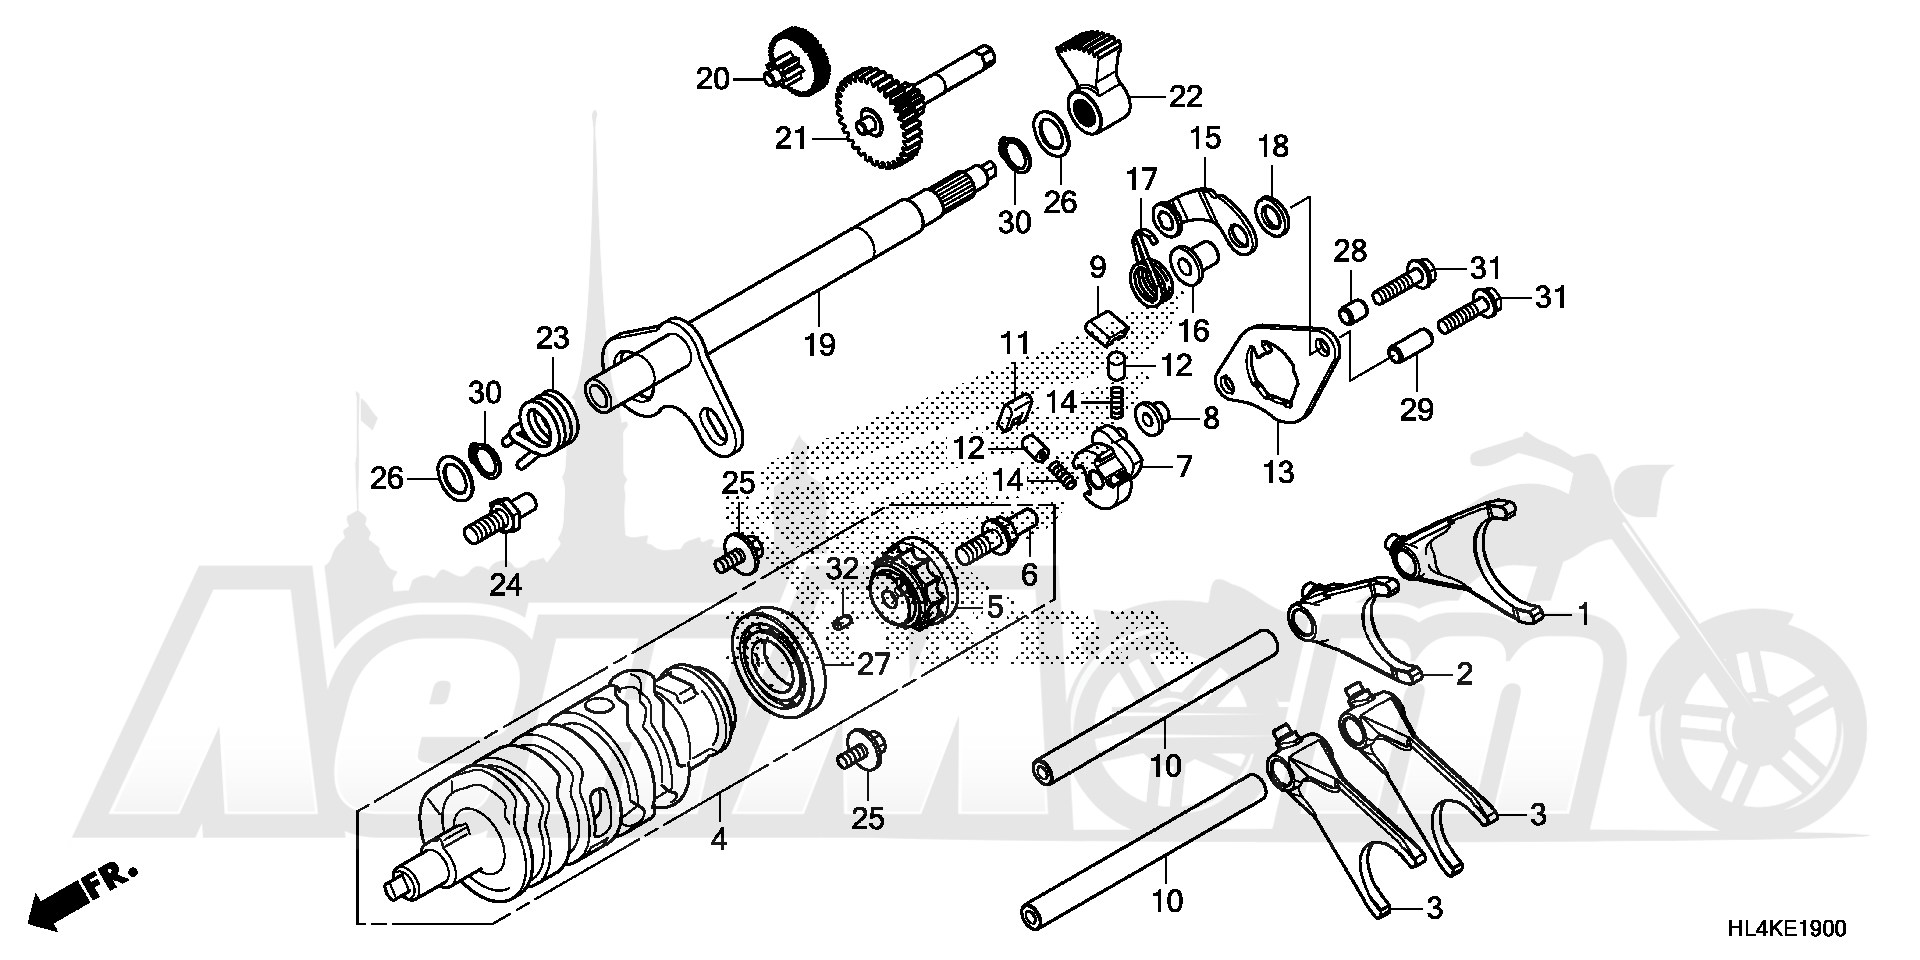 Запчасти для Квадроцикла Honda 2019 SXS1000M5D Раздел: GEARSHIFT FORK | переключение передач вилка